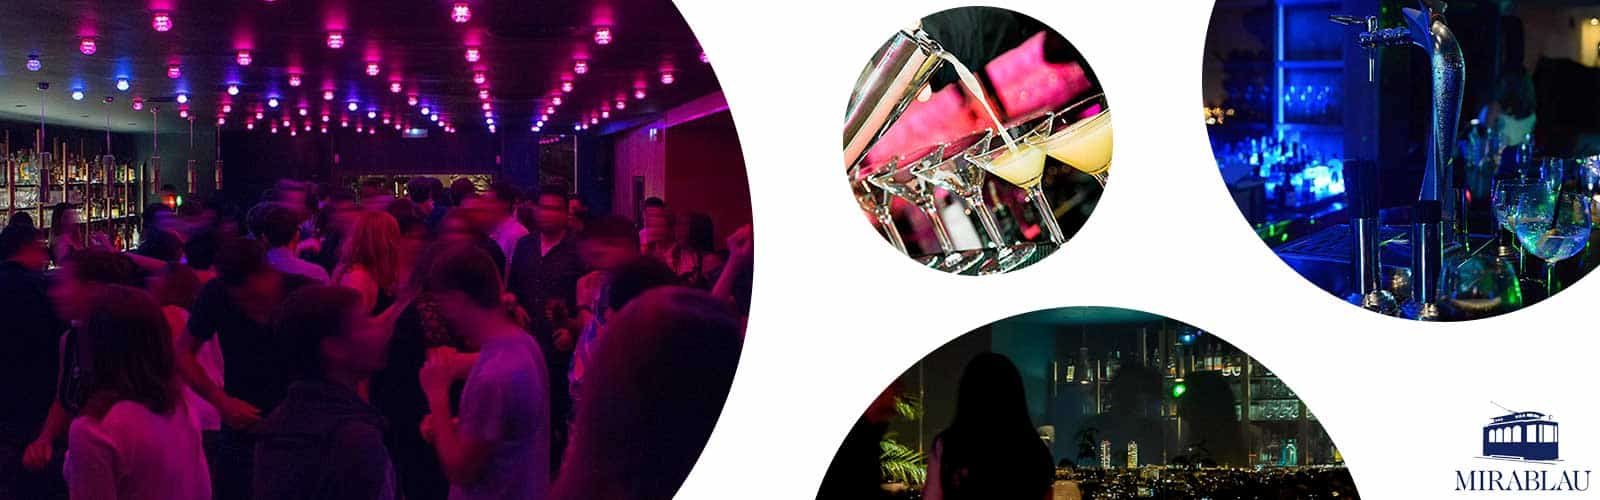 Nachtclub Mirablau Barcelona